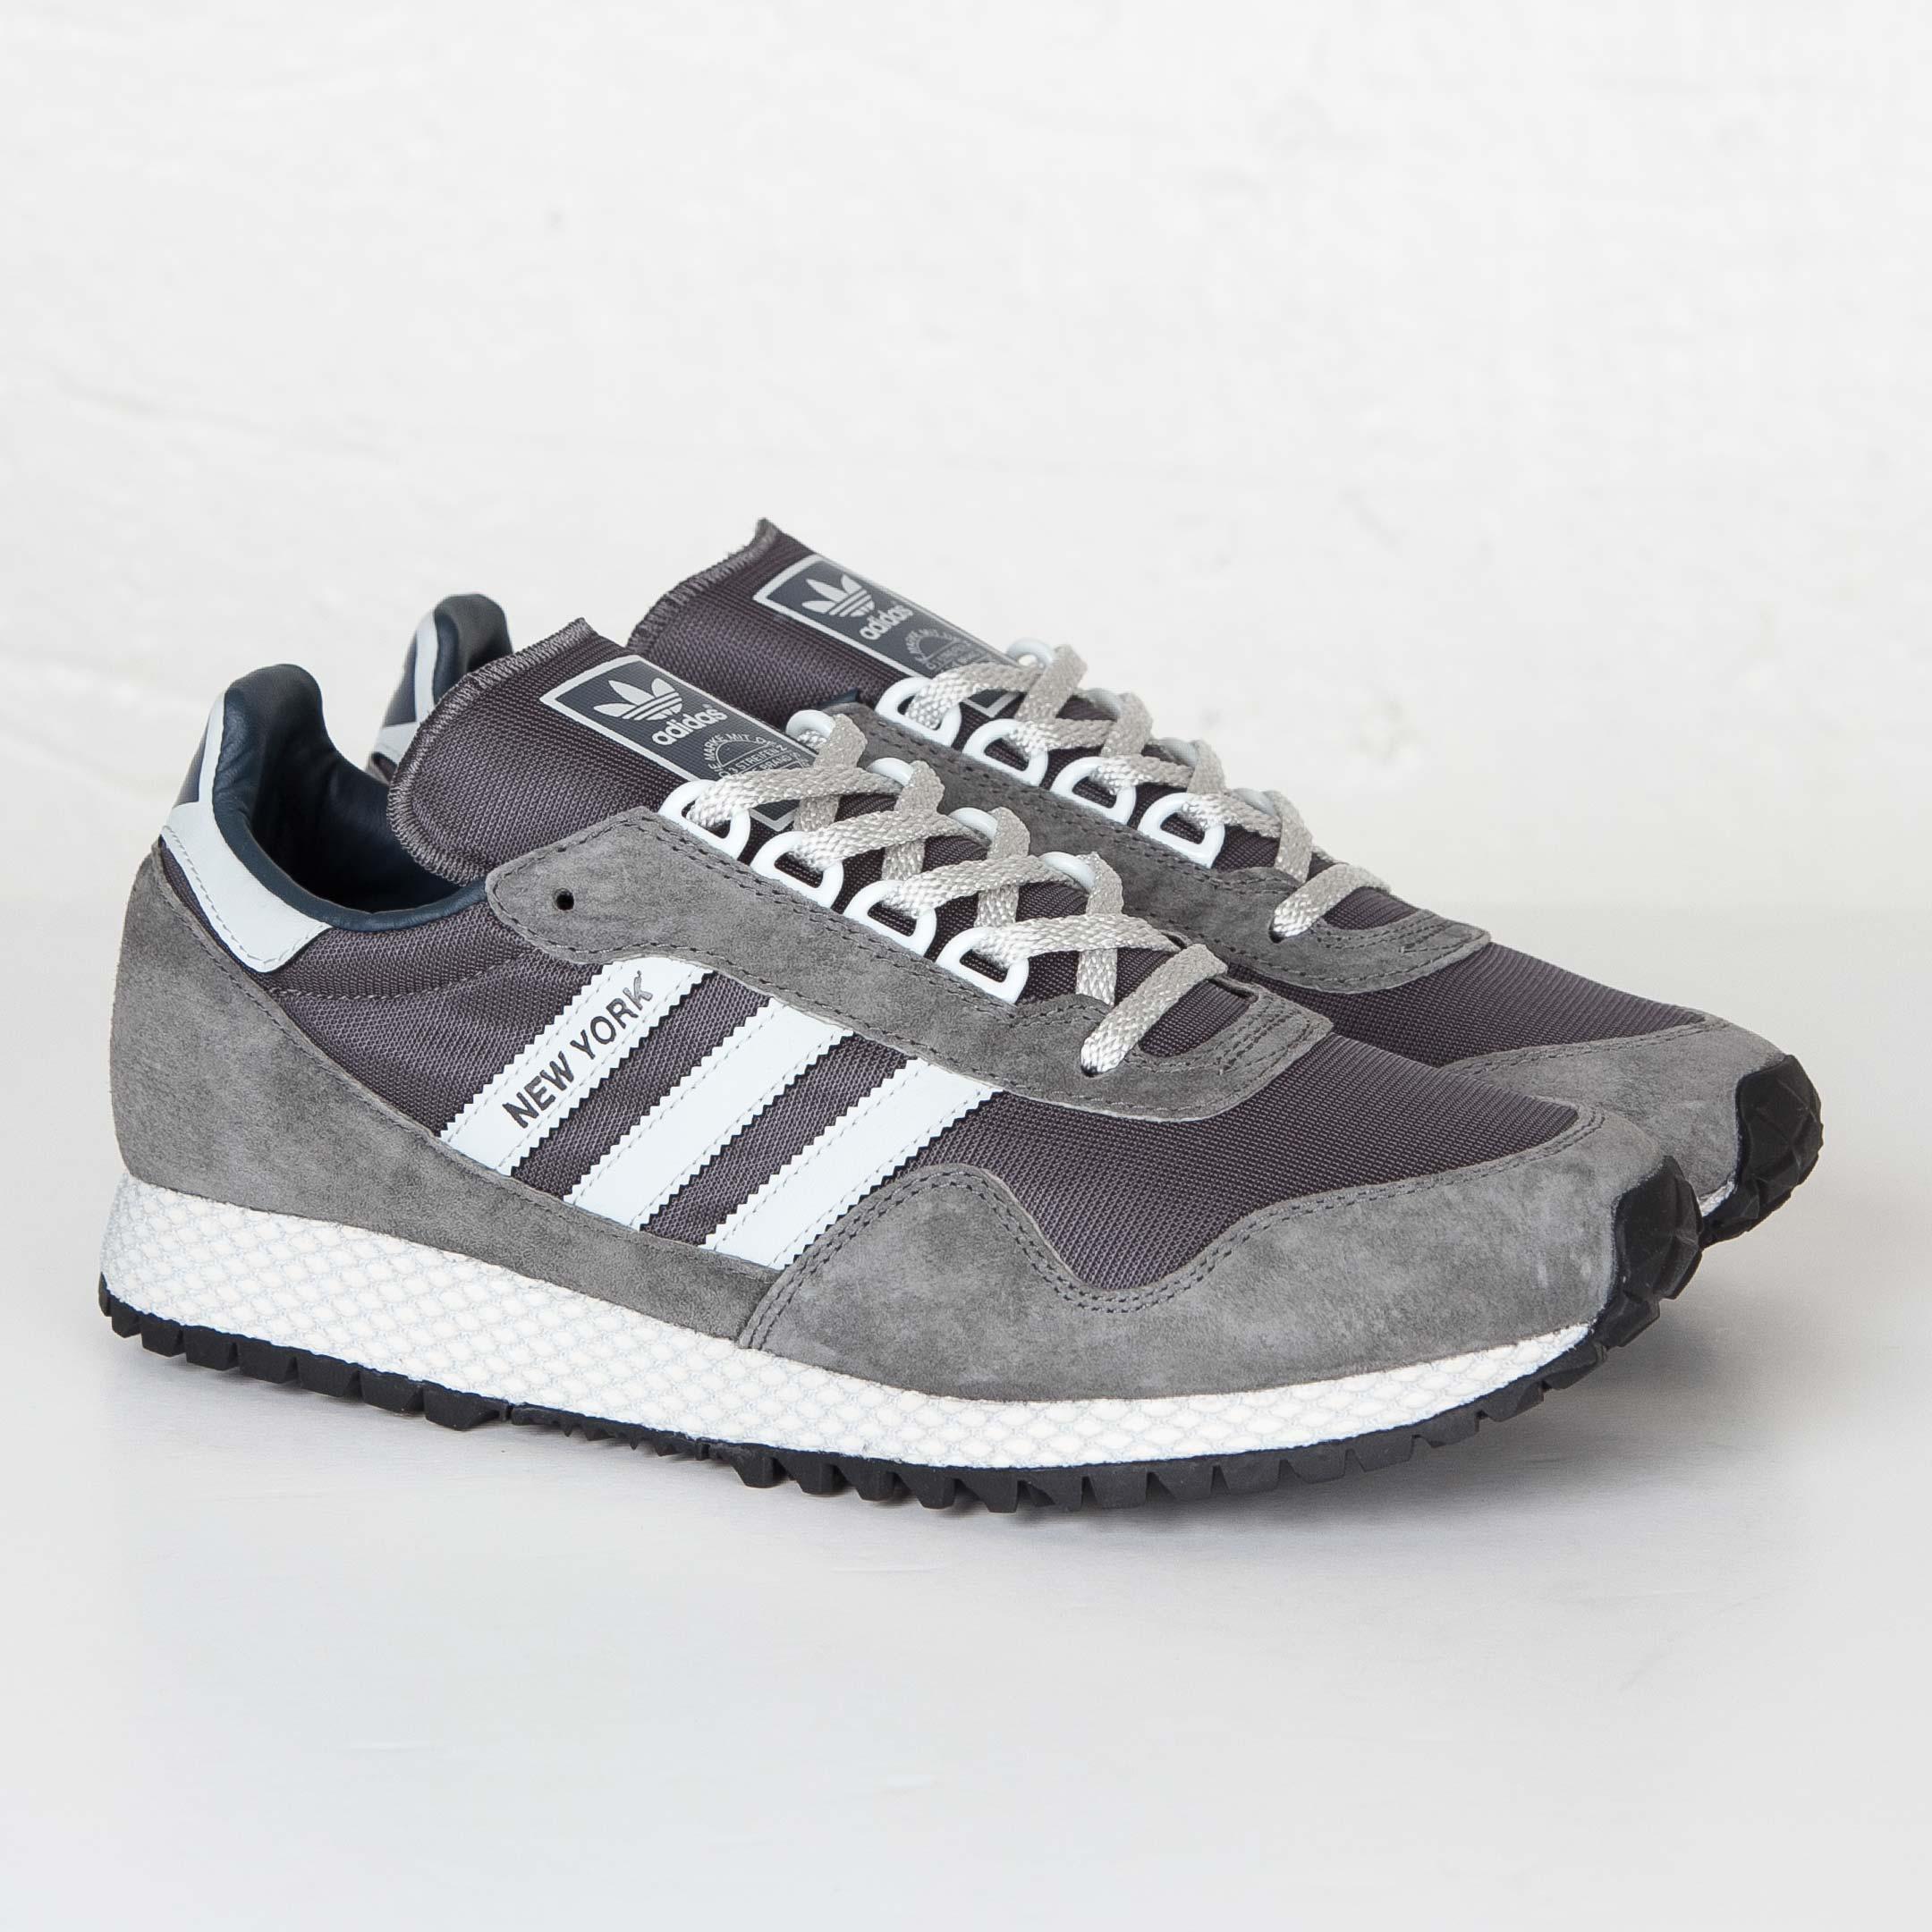 adidas New York SPZL B41179 Sneakersnstuff I Sneakers